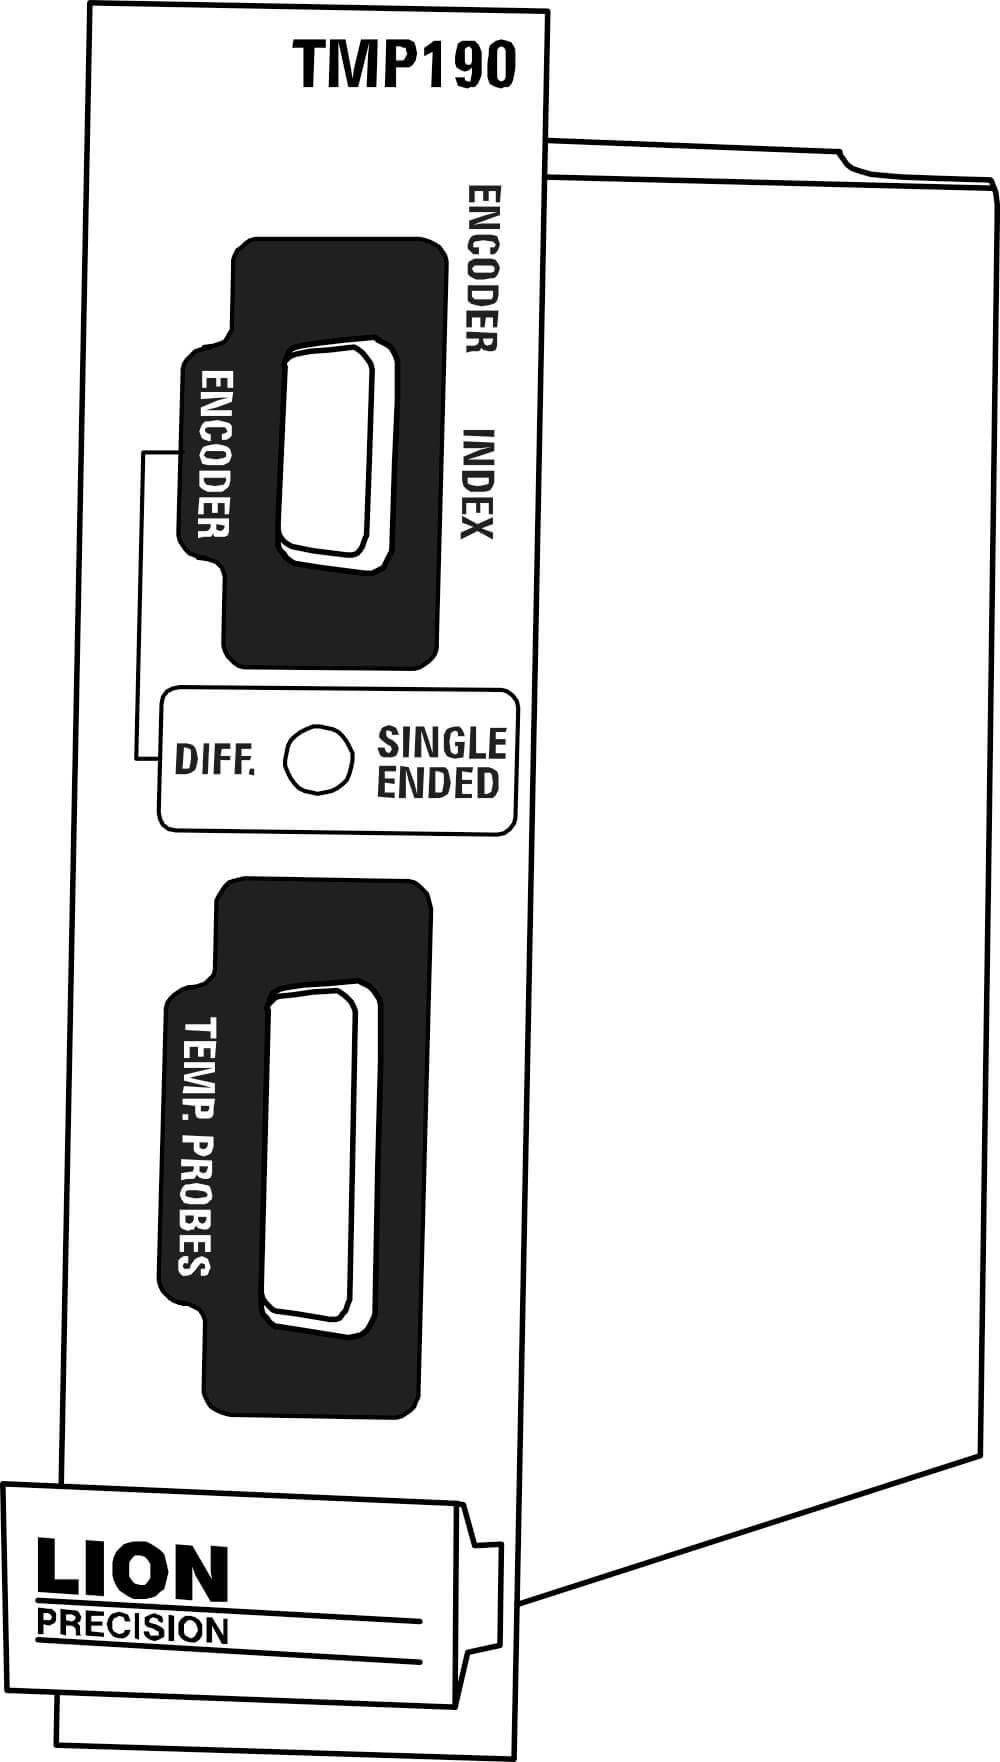 Diagrama TMP190